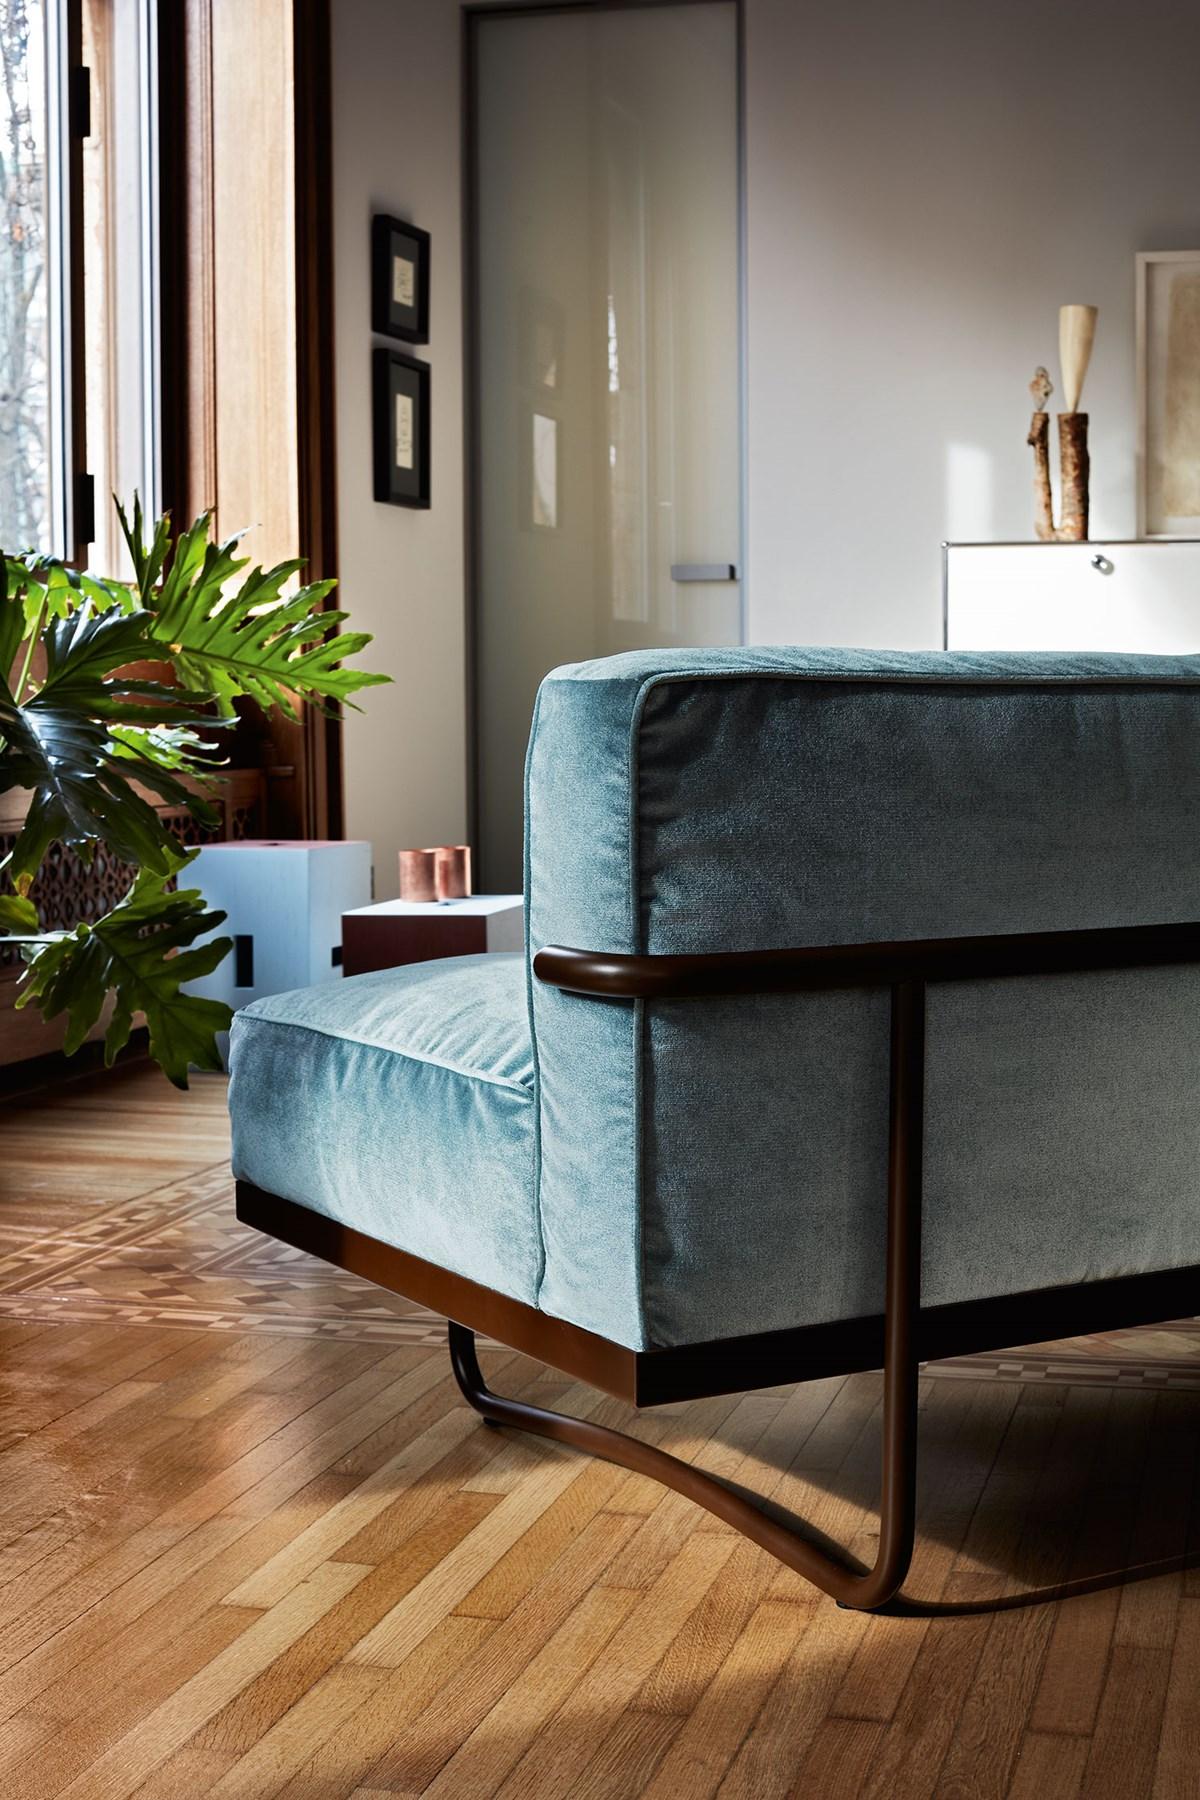 Cassina-Le Corbusier-Pierre Jeanneret-Charlotte-Perriand-LC5-Sofa-Matisse-6